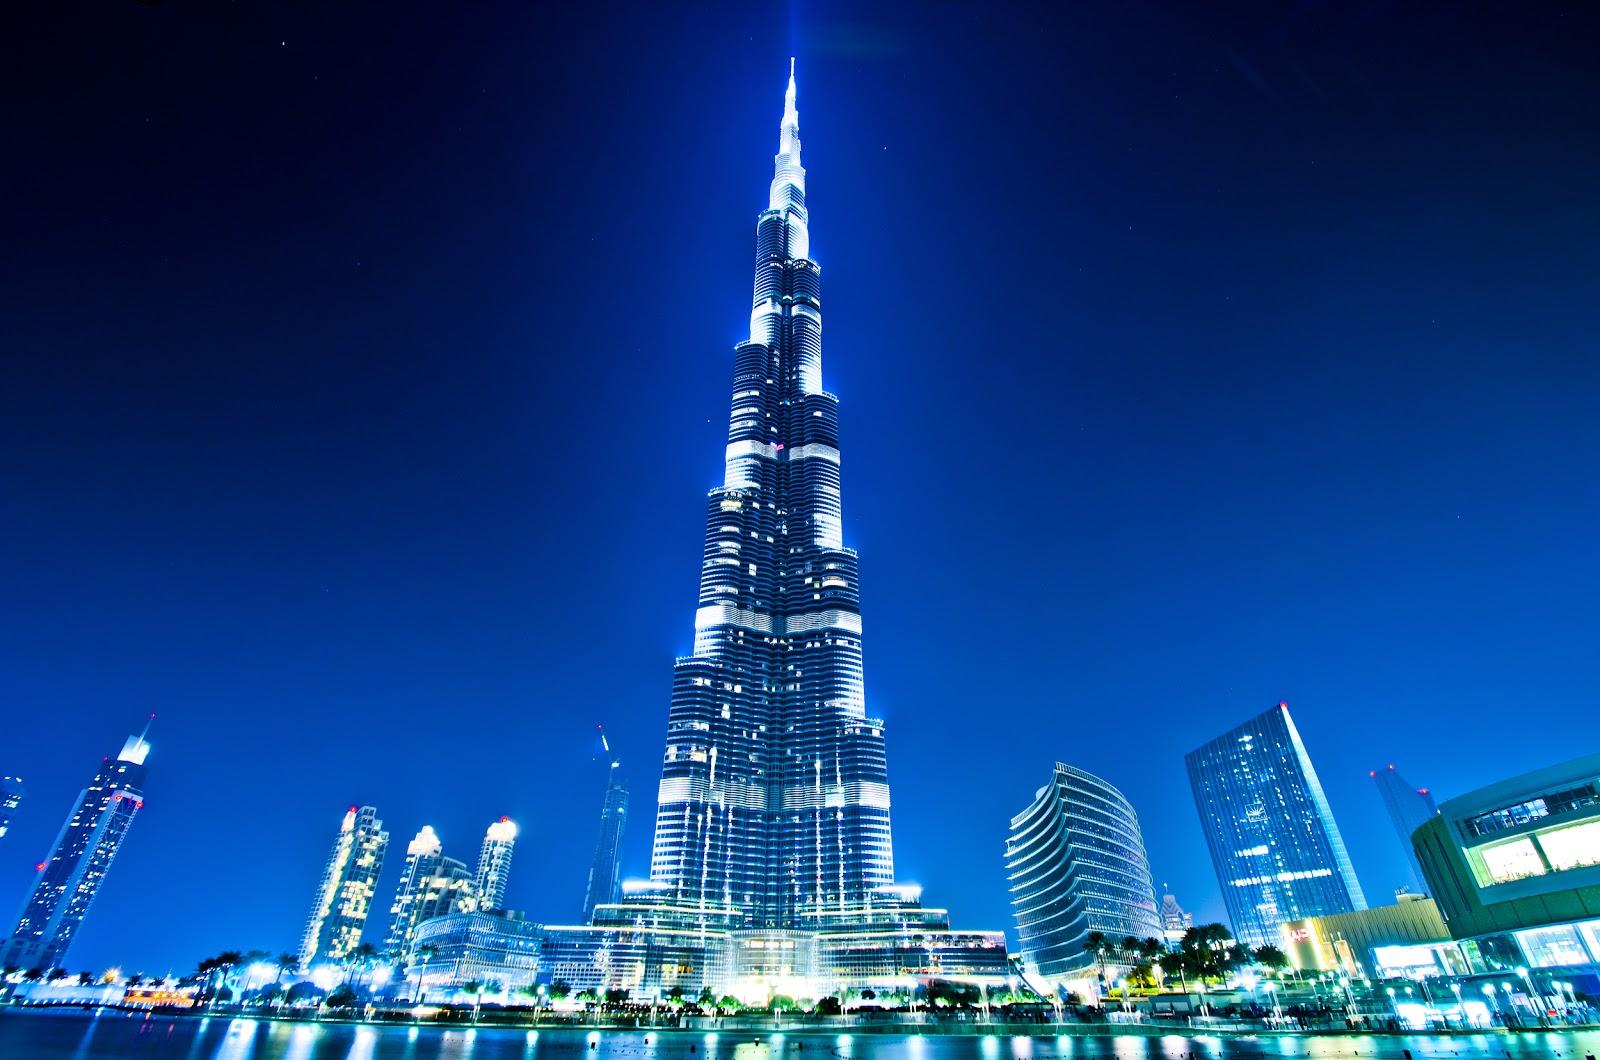 World S Tallest Building Burj Khalifa Dubai At Night